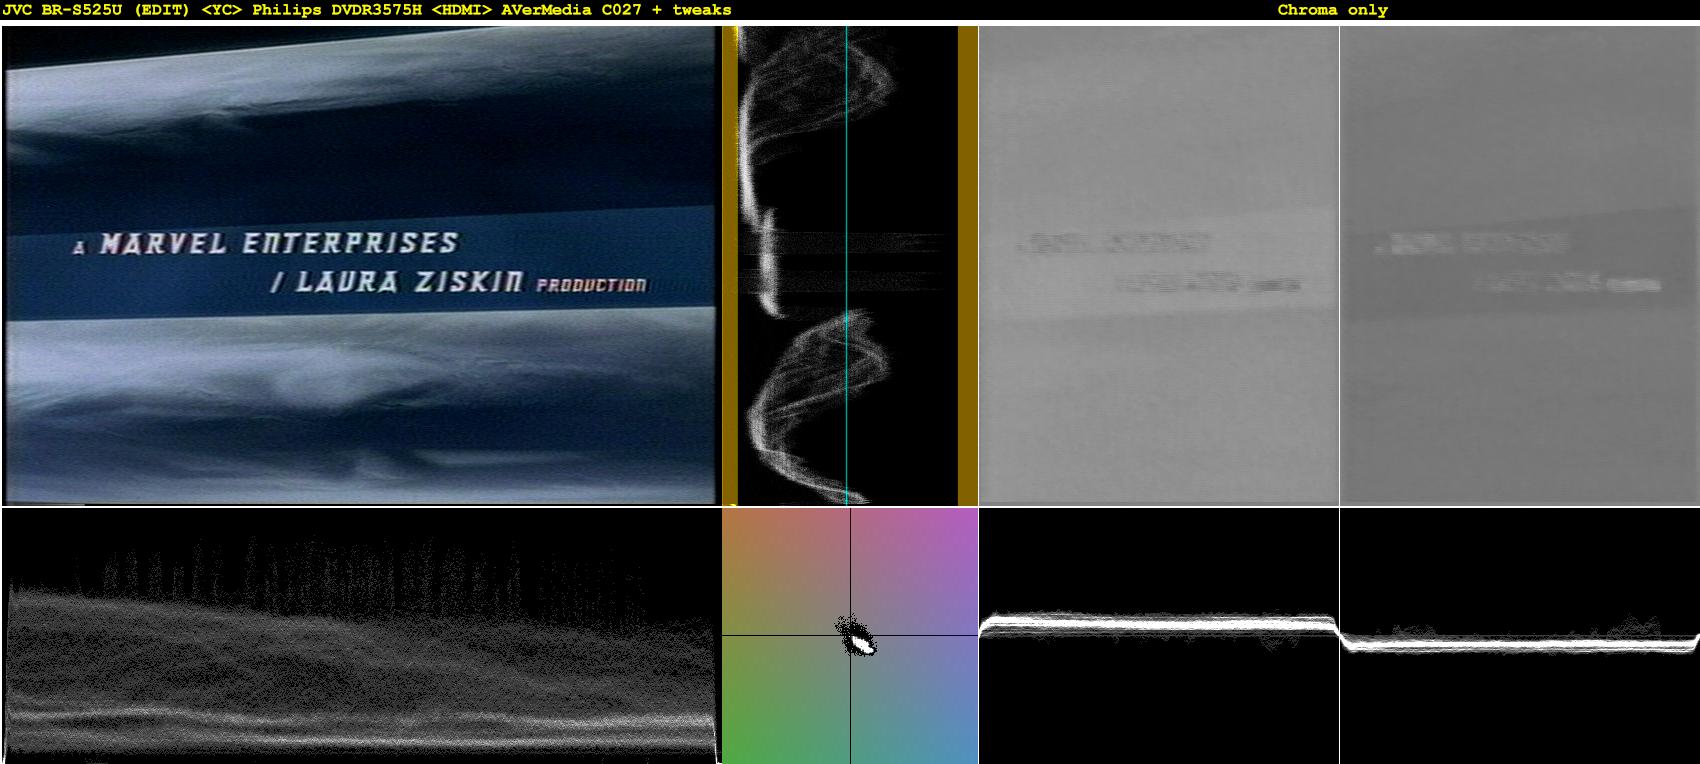 Click image for larger version  Name:0-09-01 - JVC BR-S525U (EDIT).png Views:1507 Size:931.4 KB ID:37665